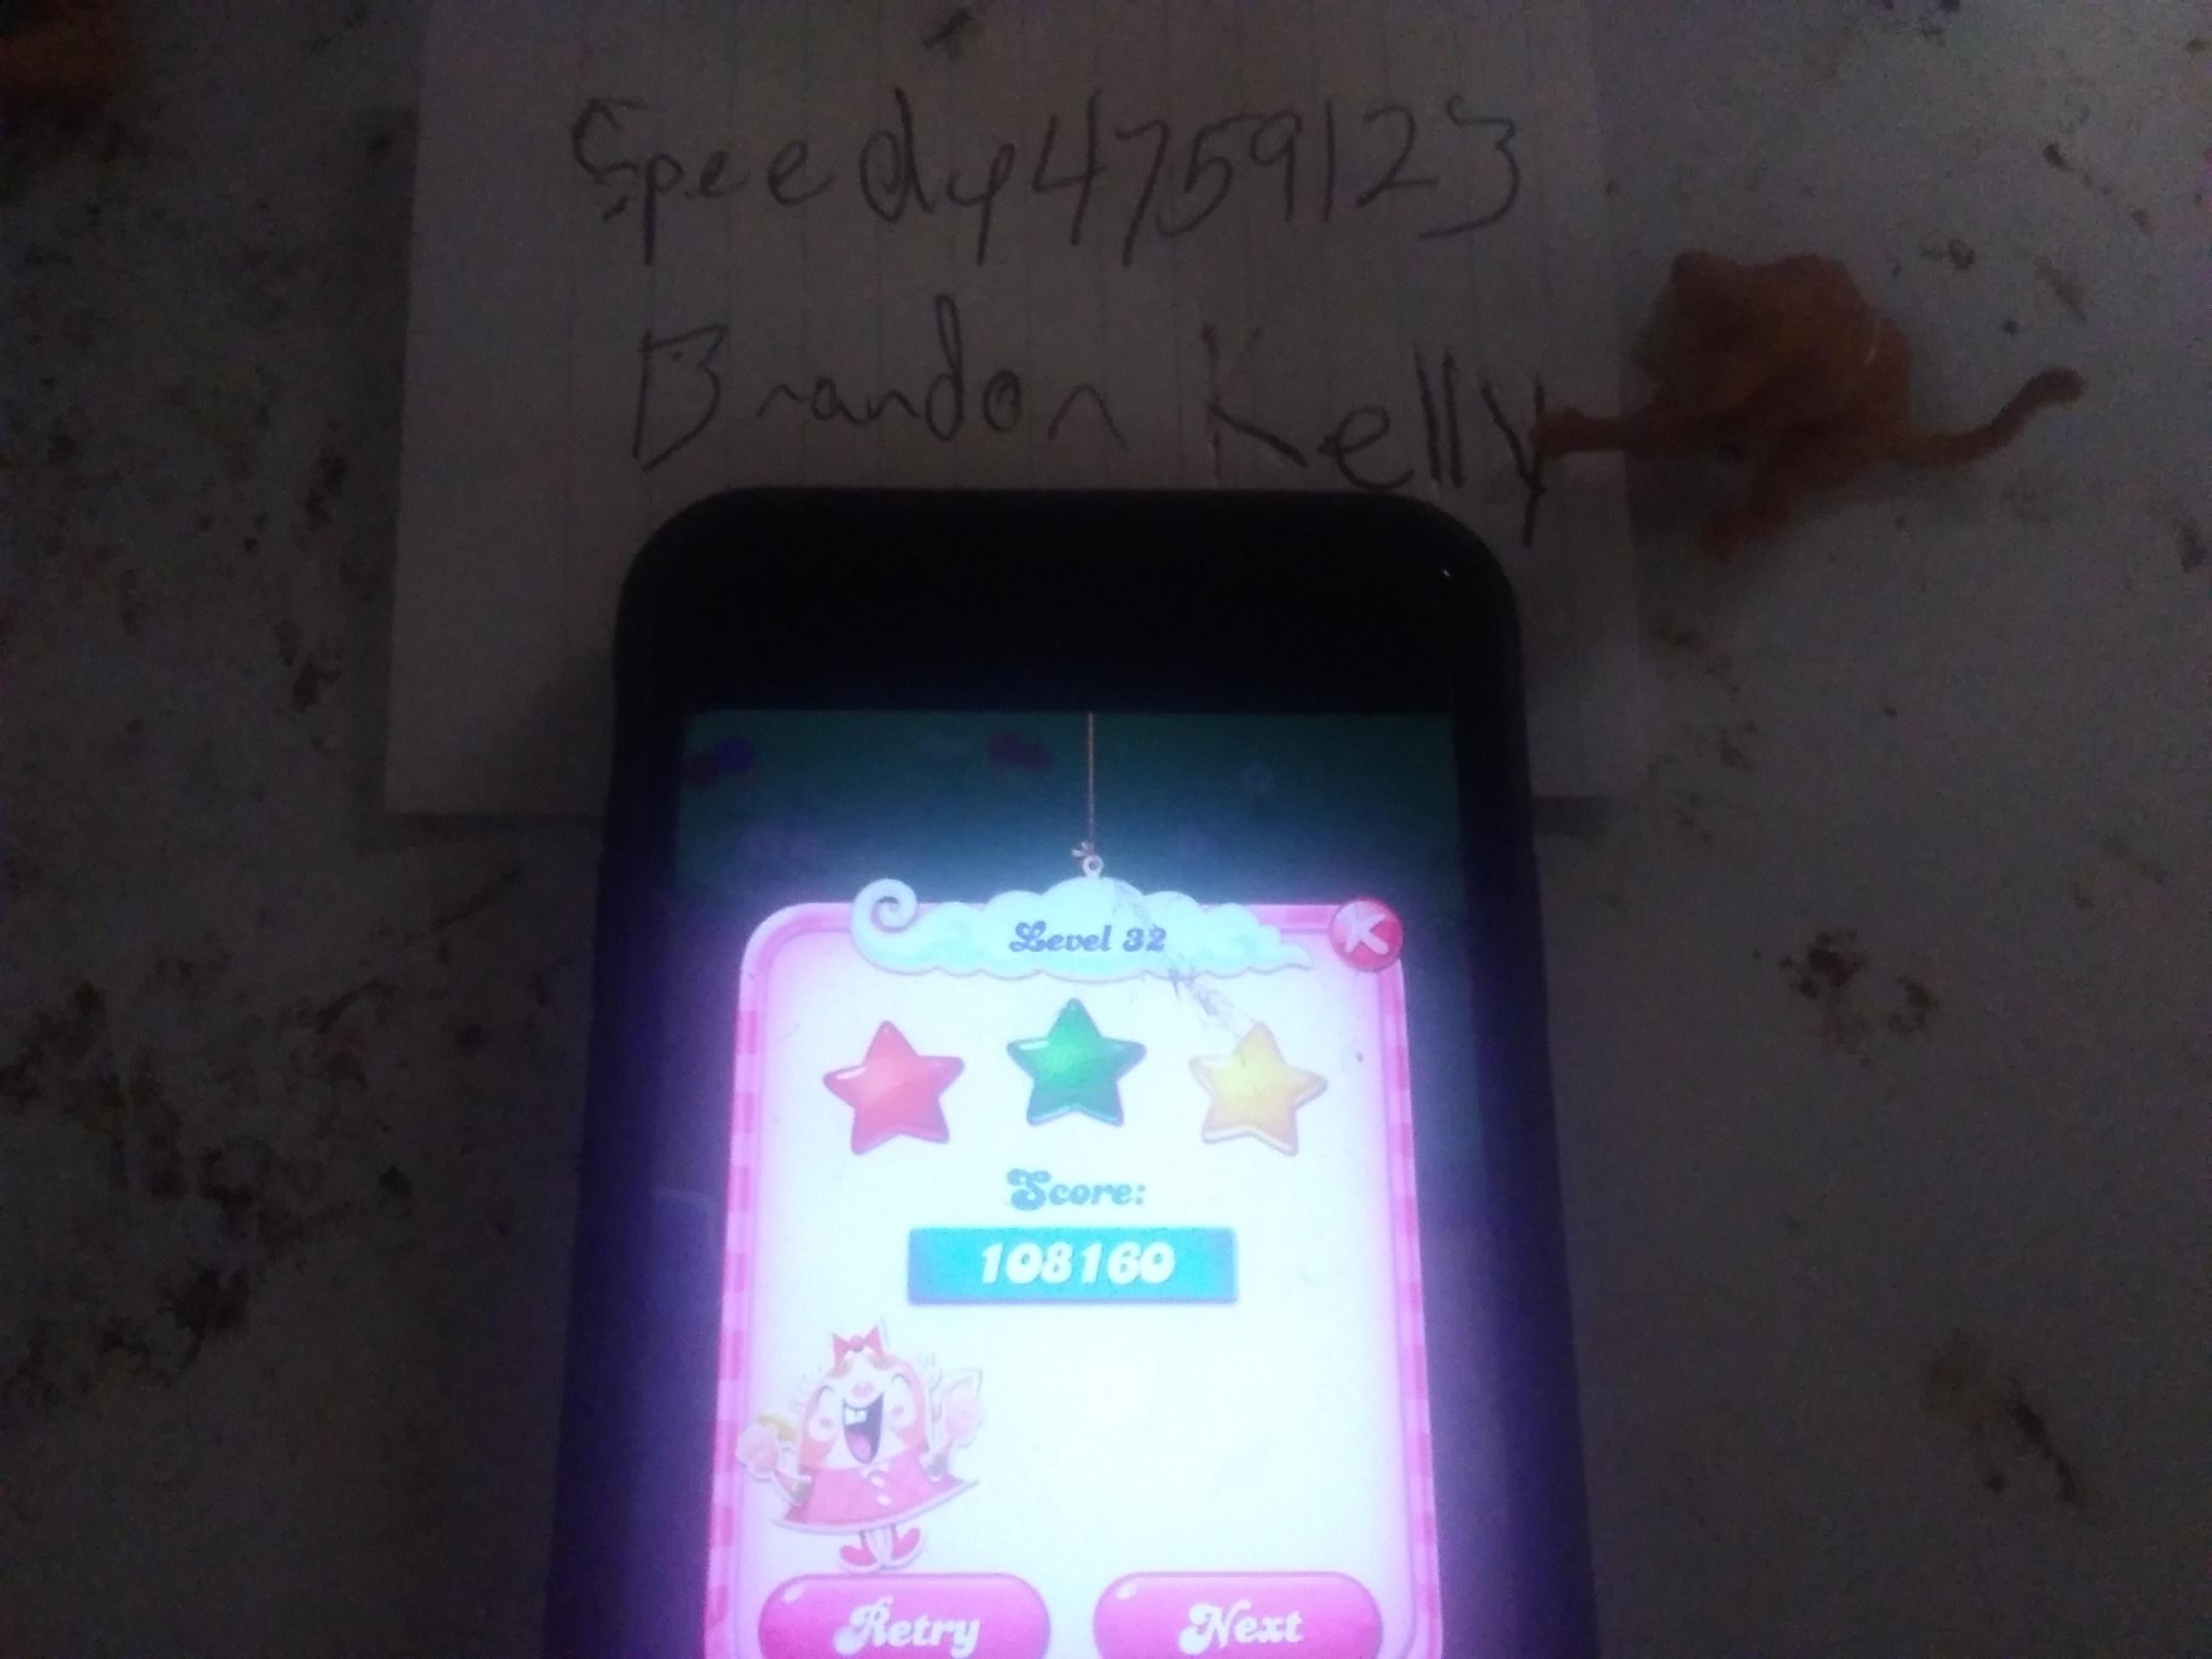 speedy4759123: Candy Crush Saga: Level 032 (iOS) 108,160 points on 2019-08-05 22:48:47